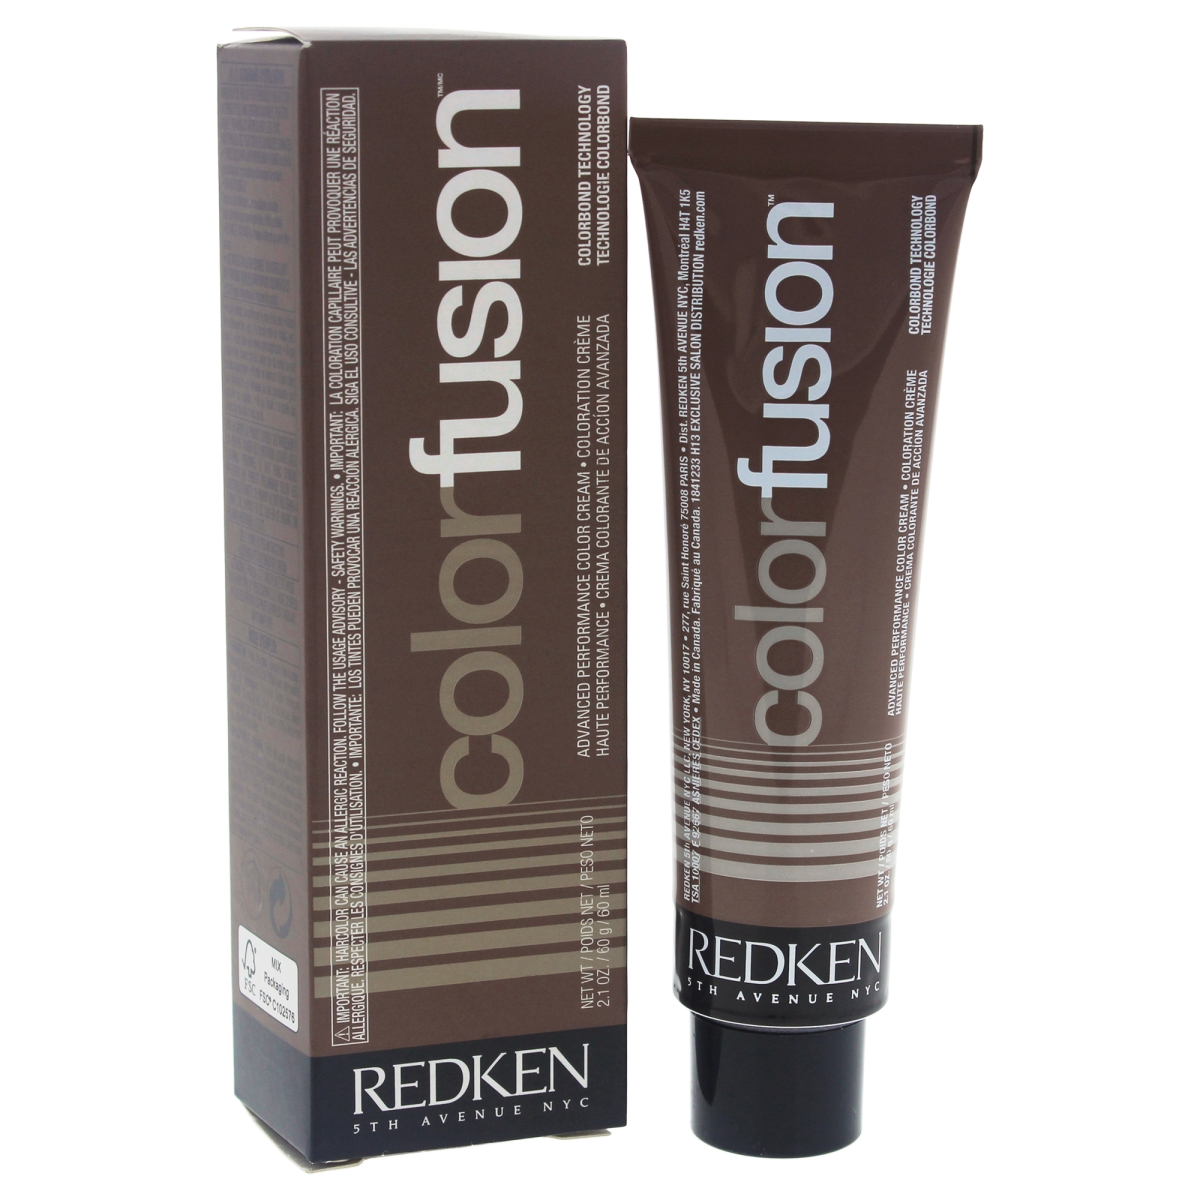 Redken U-HC-11725 2.1 oz Color Fusion Cream No. 3 Natural Balance Neutral Hair Color for Unisex